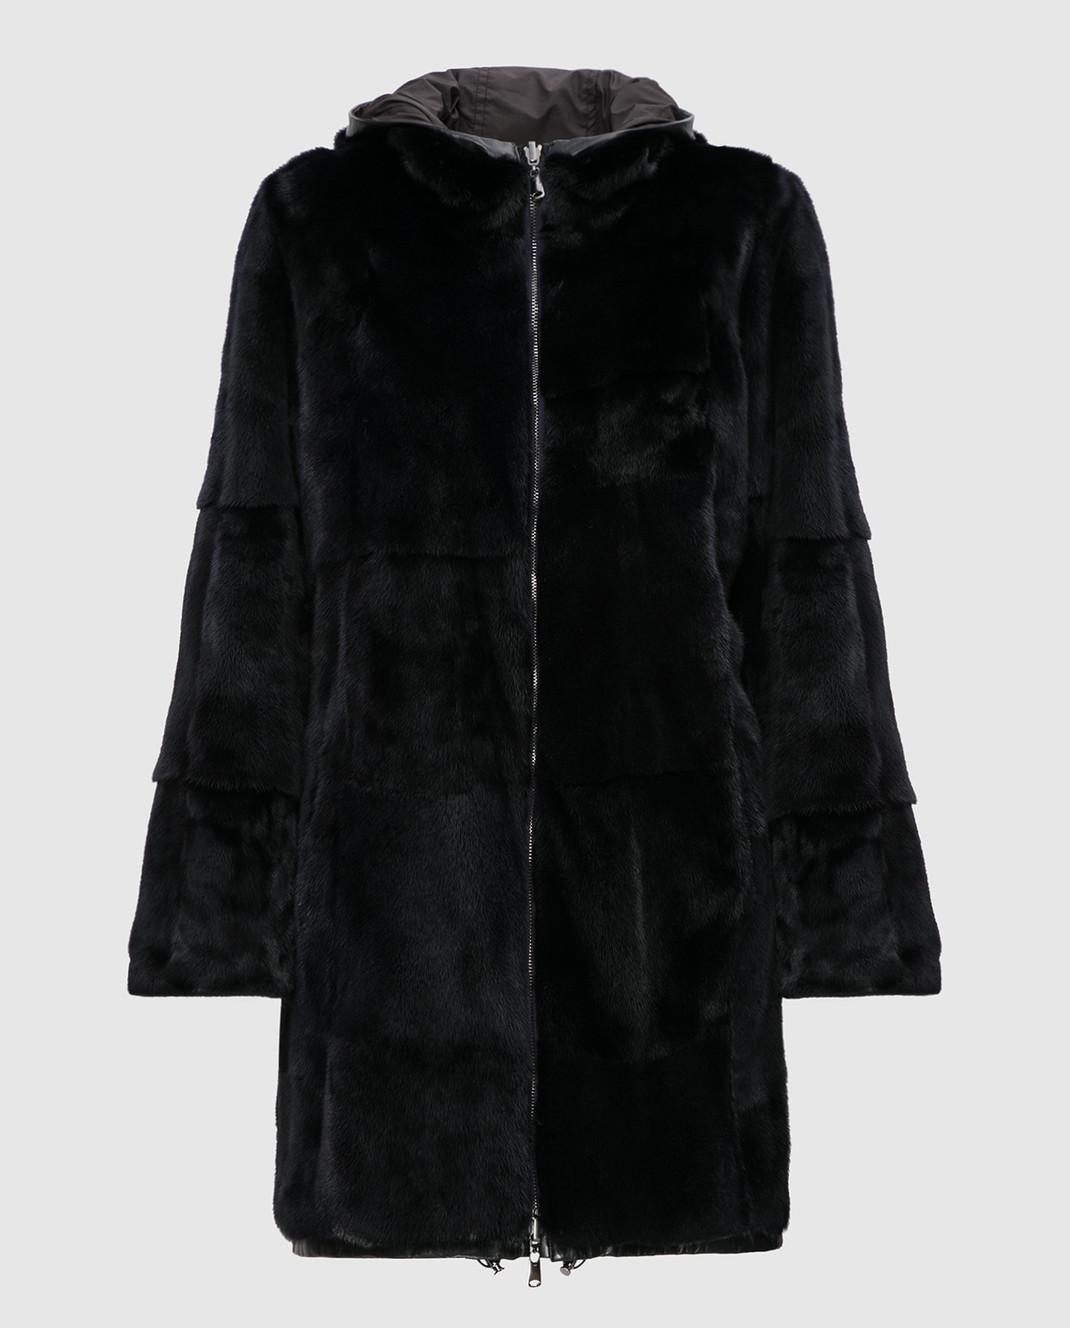 Real Furs House Черная двусторонняя парка 943RFH